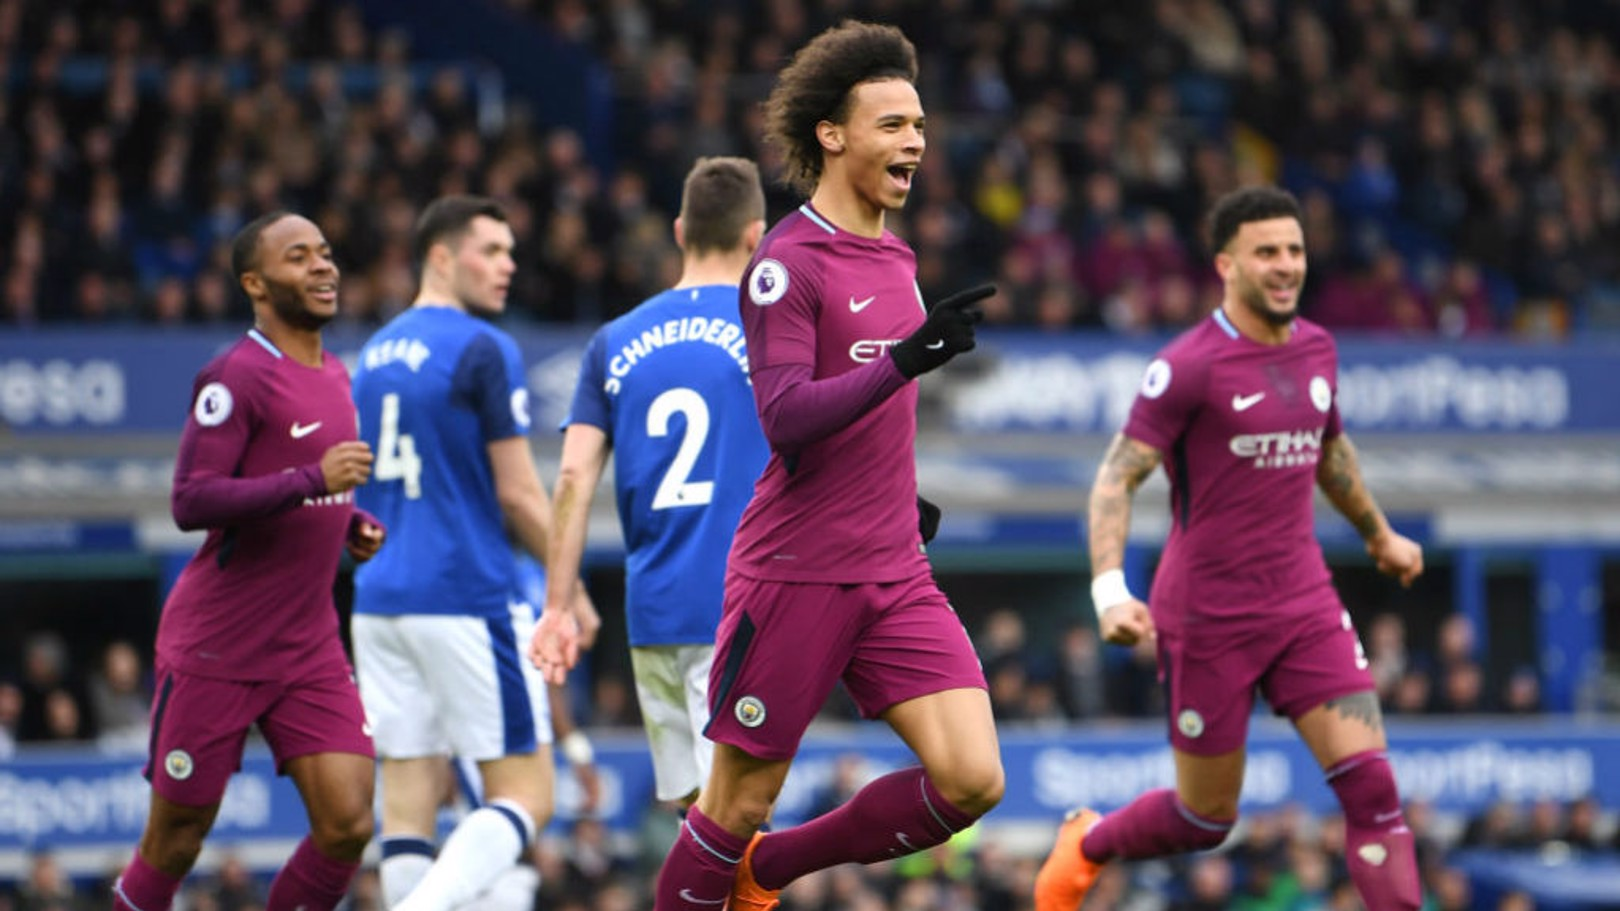 Everton v City: Supporter information